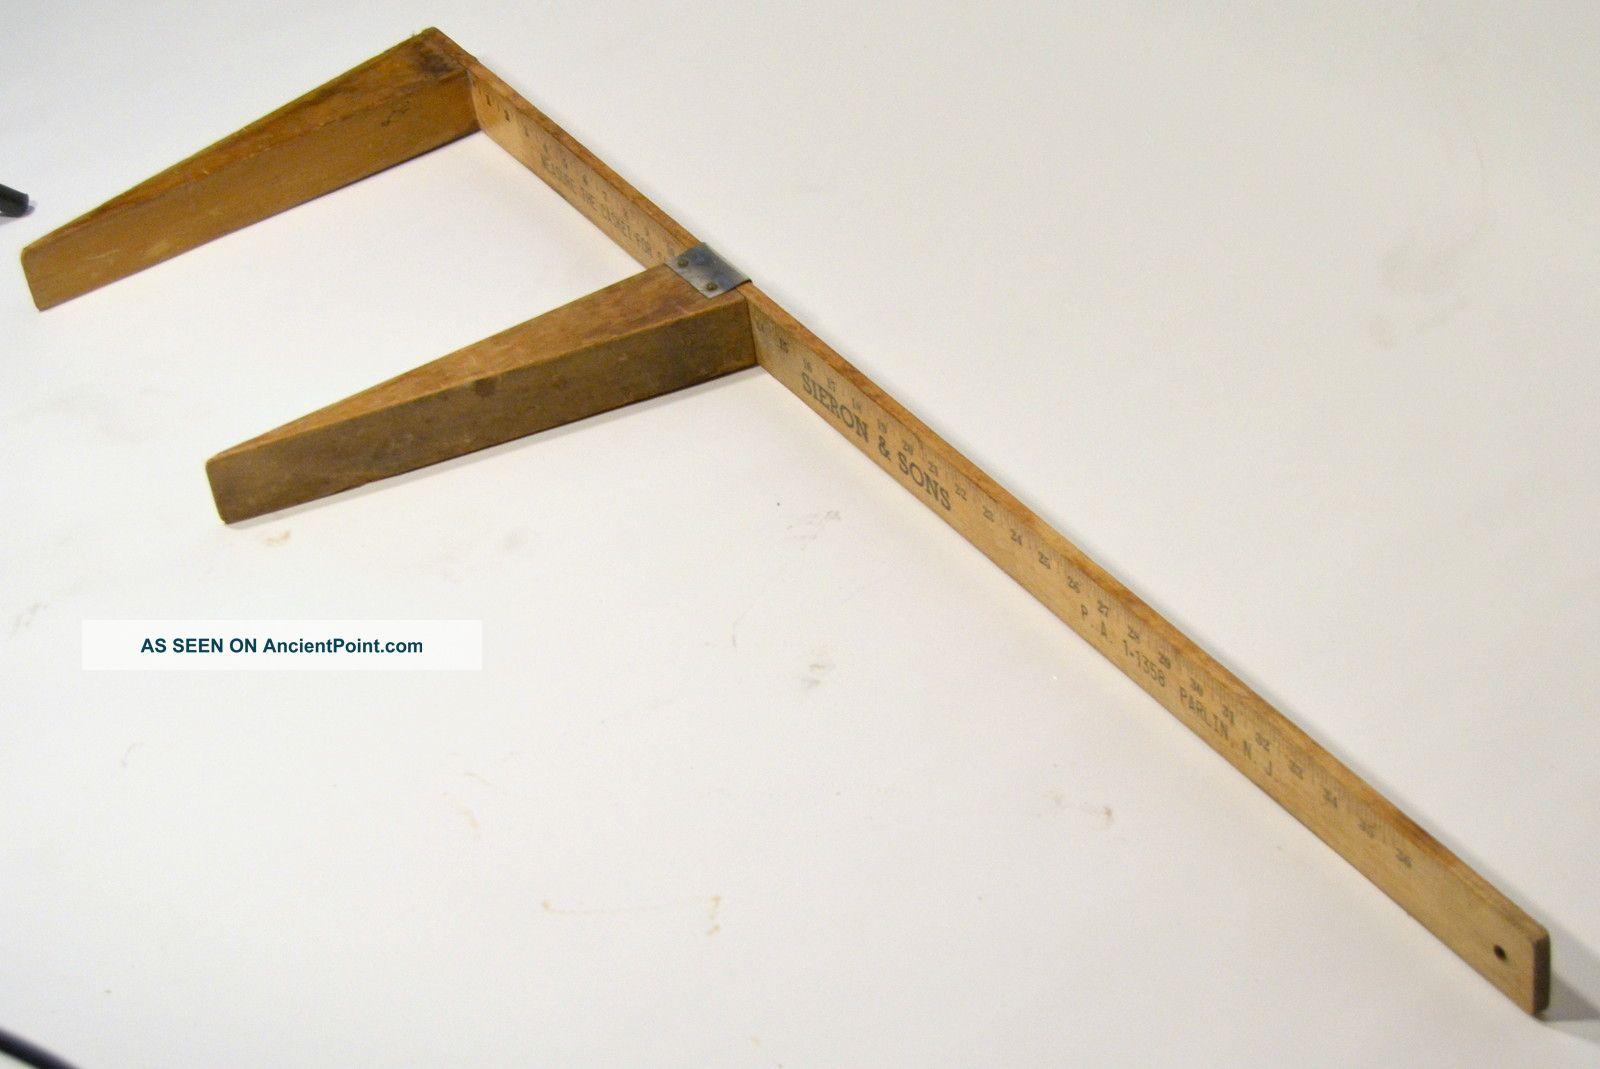 Rare Antique Funeral Home Casket Wooden Calipers: Measures Caskets